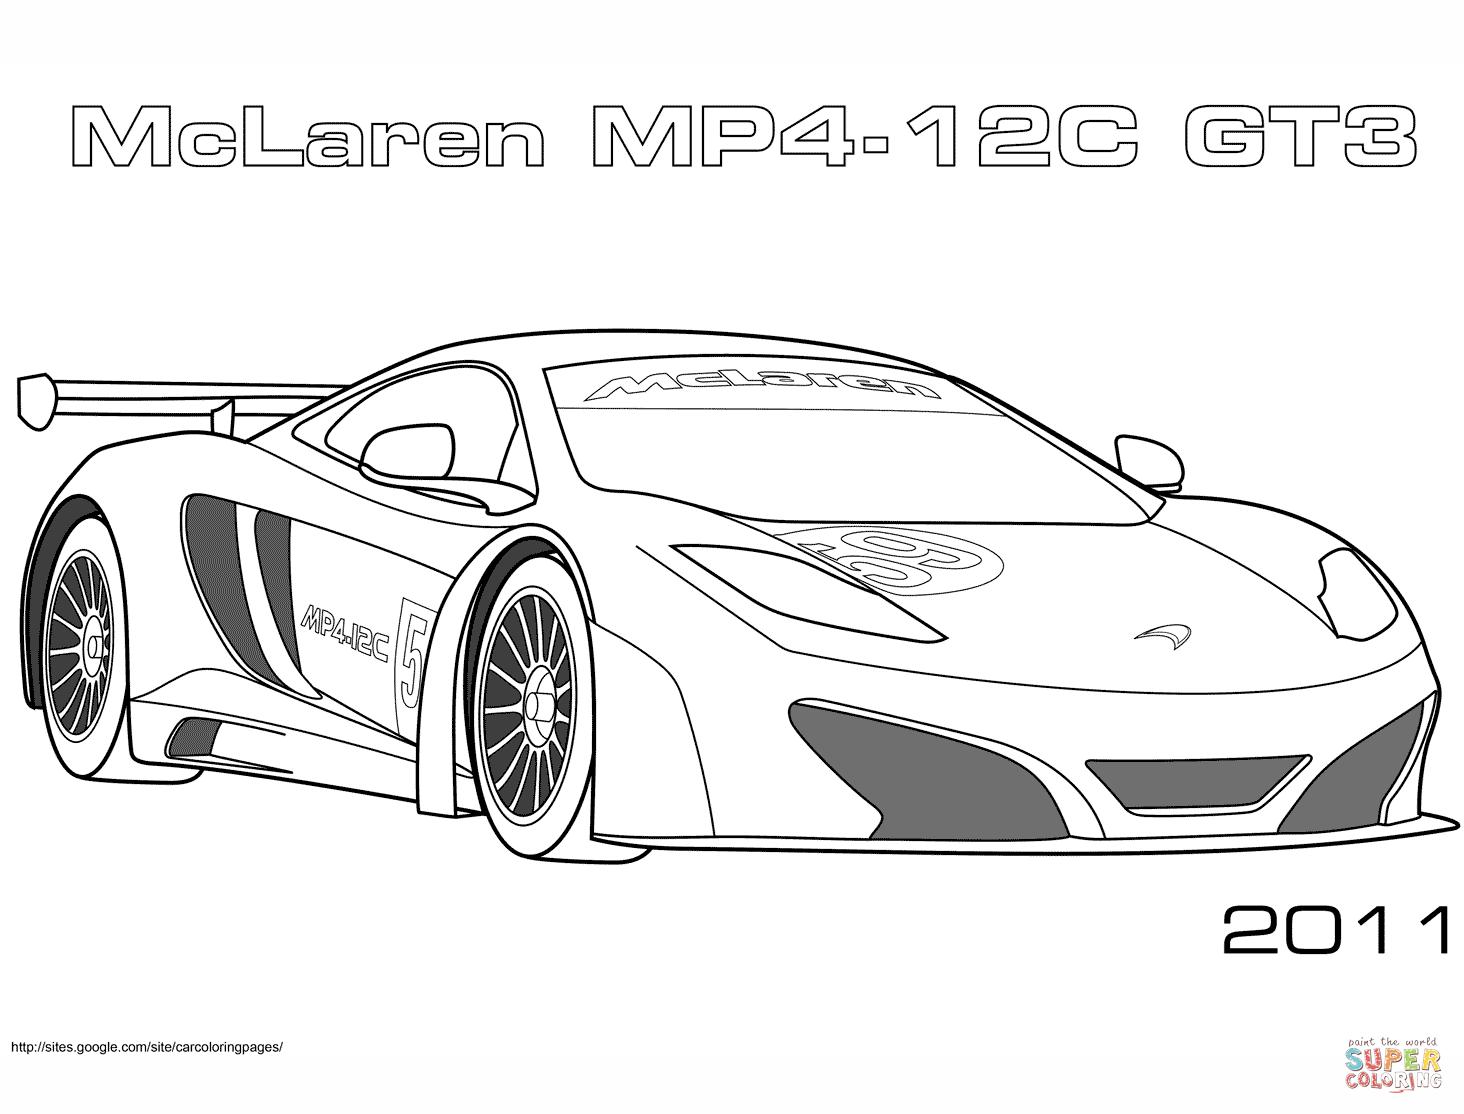 Perfecto Lamborghini Para Imprimir Para Colorear Foto - Dibujos Para ...